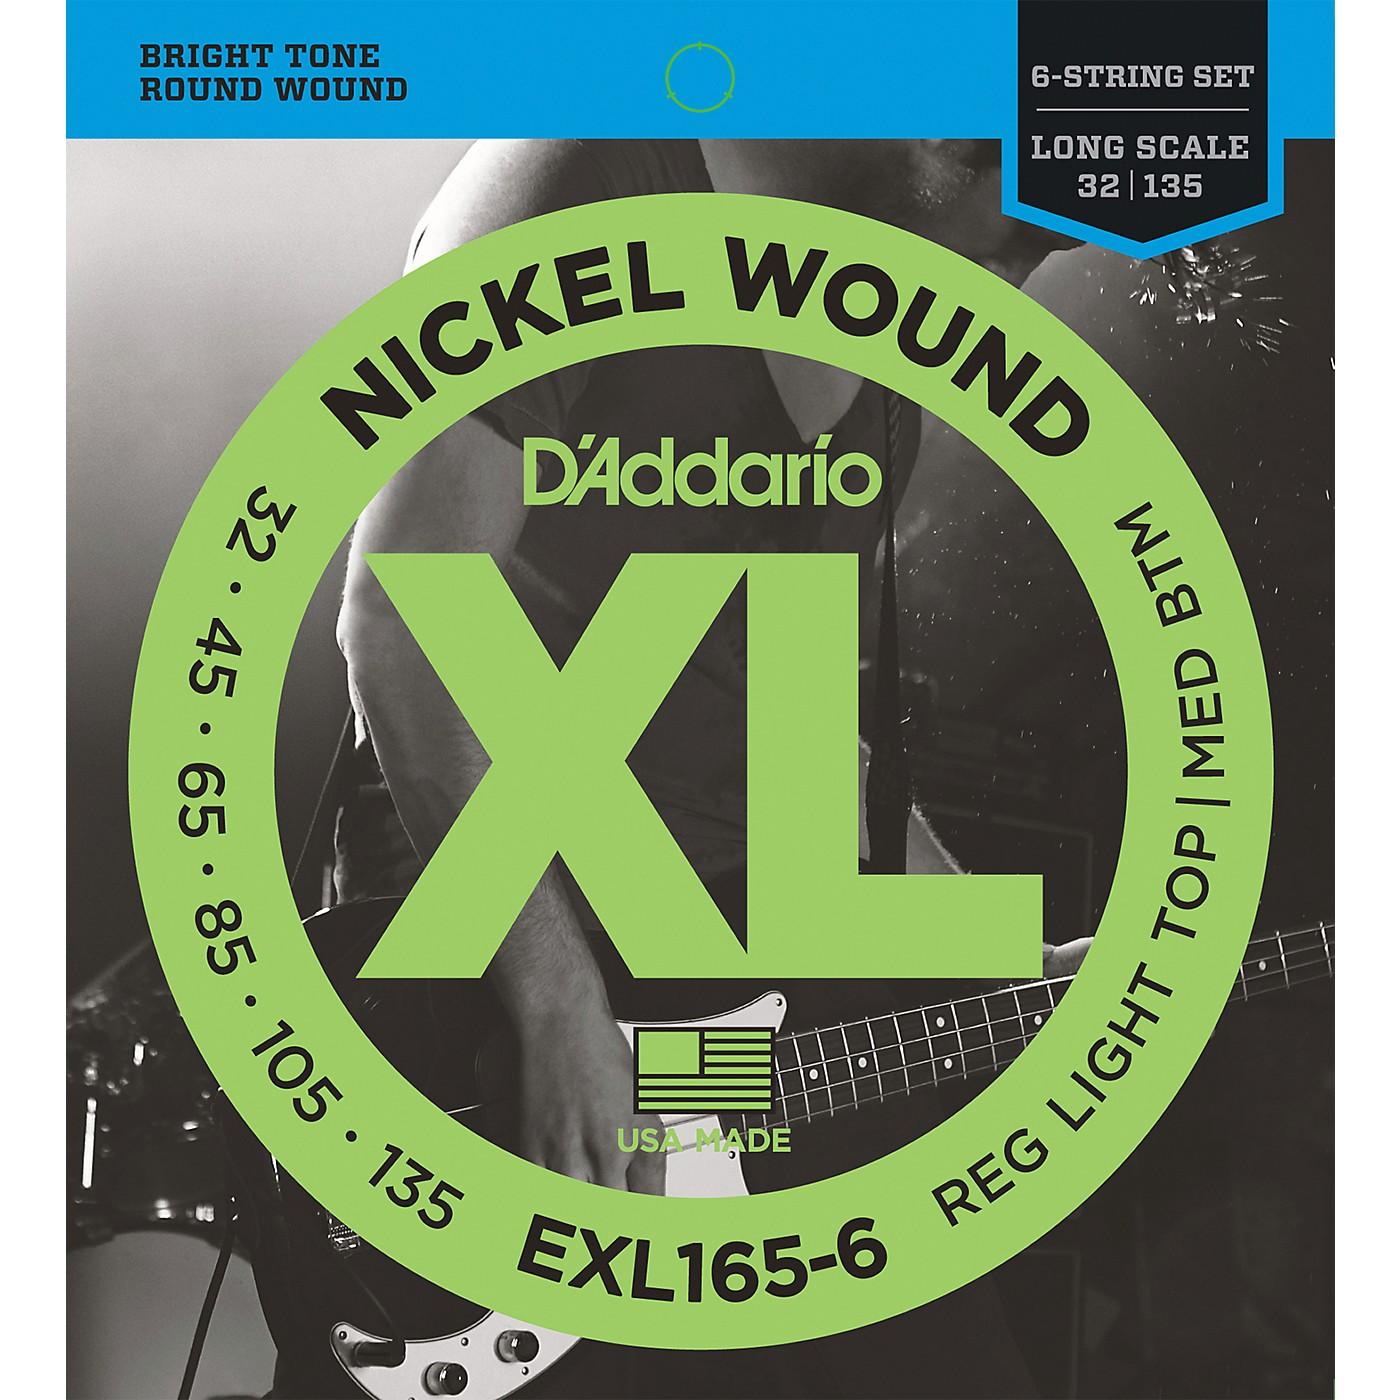 D'Addario EXL165-6 XL 6-String Bass Soft/Regular String Set thumbnail